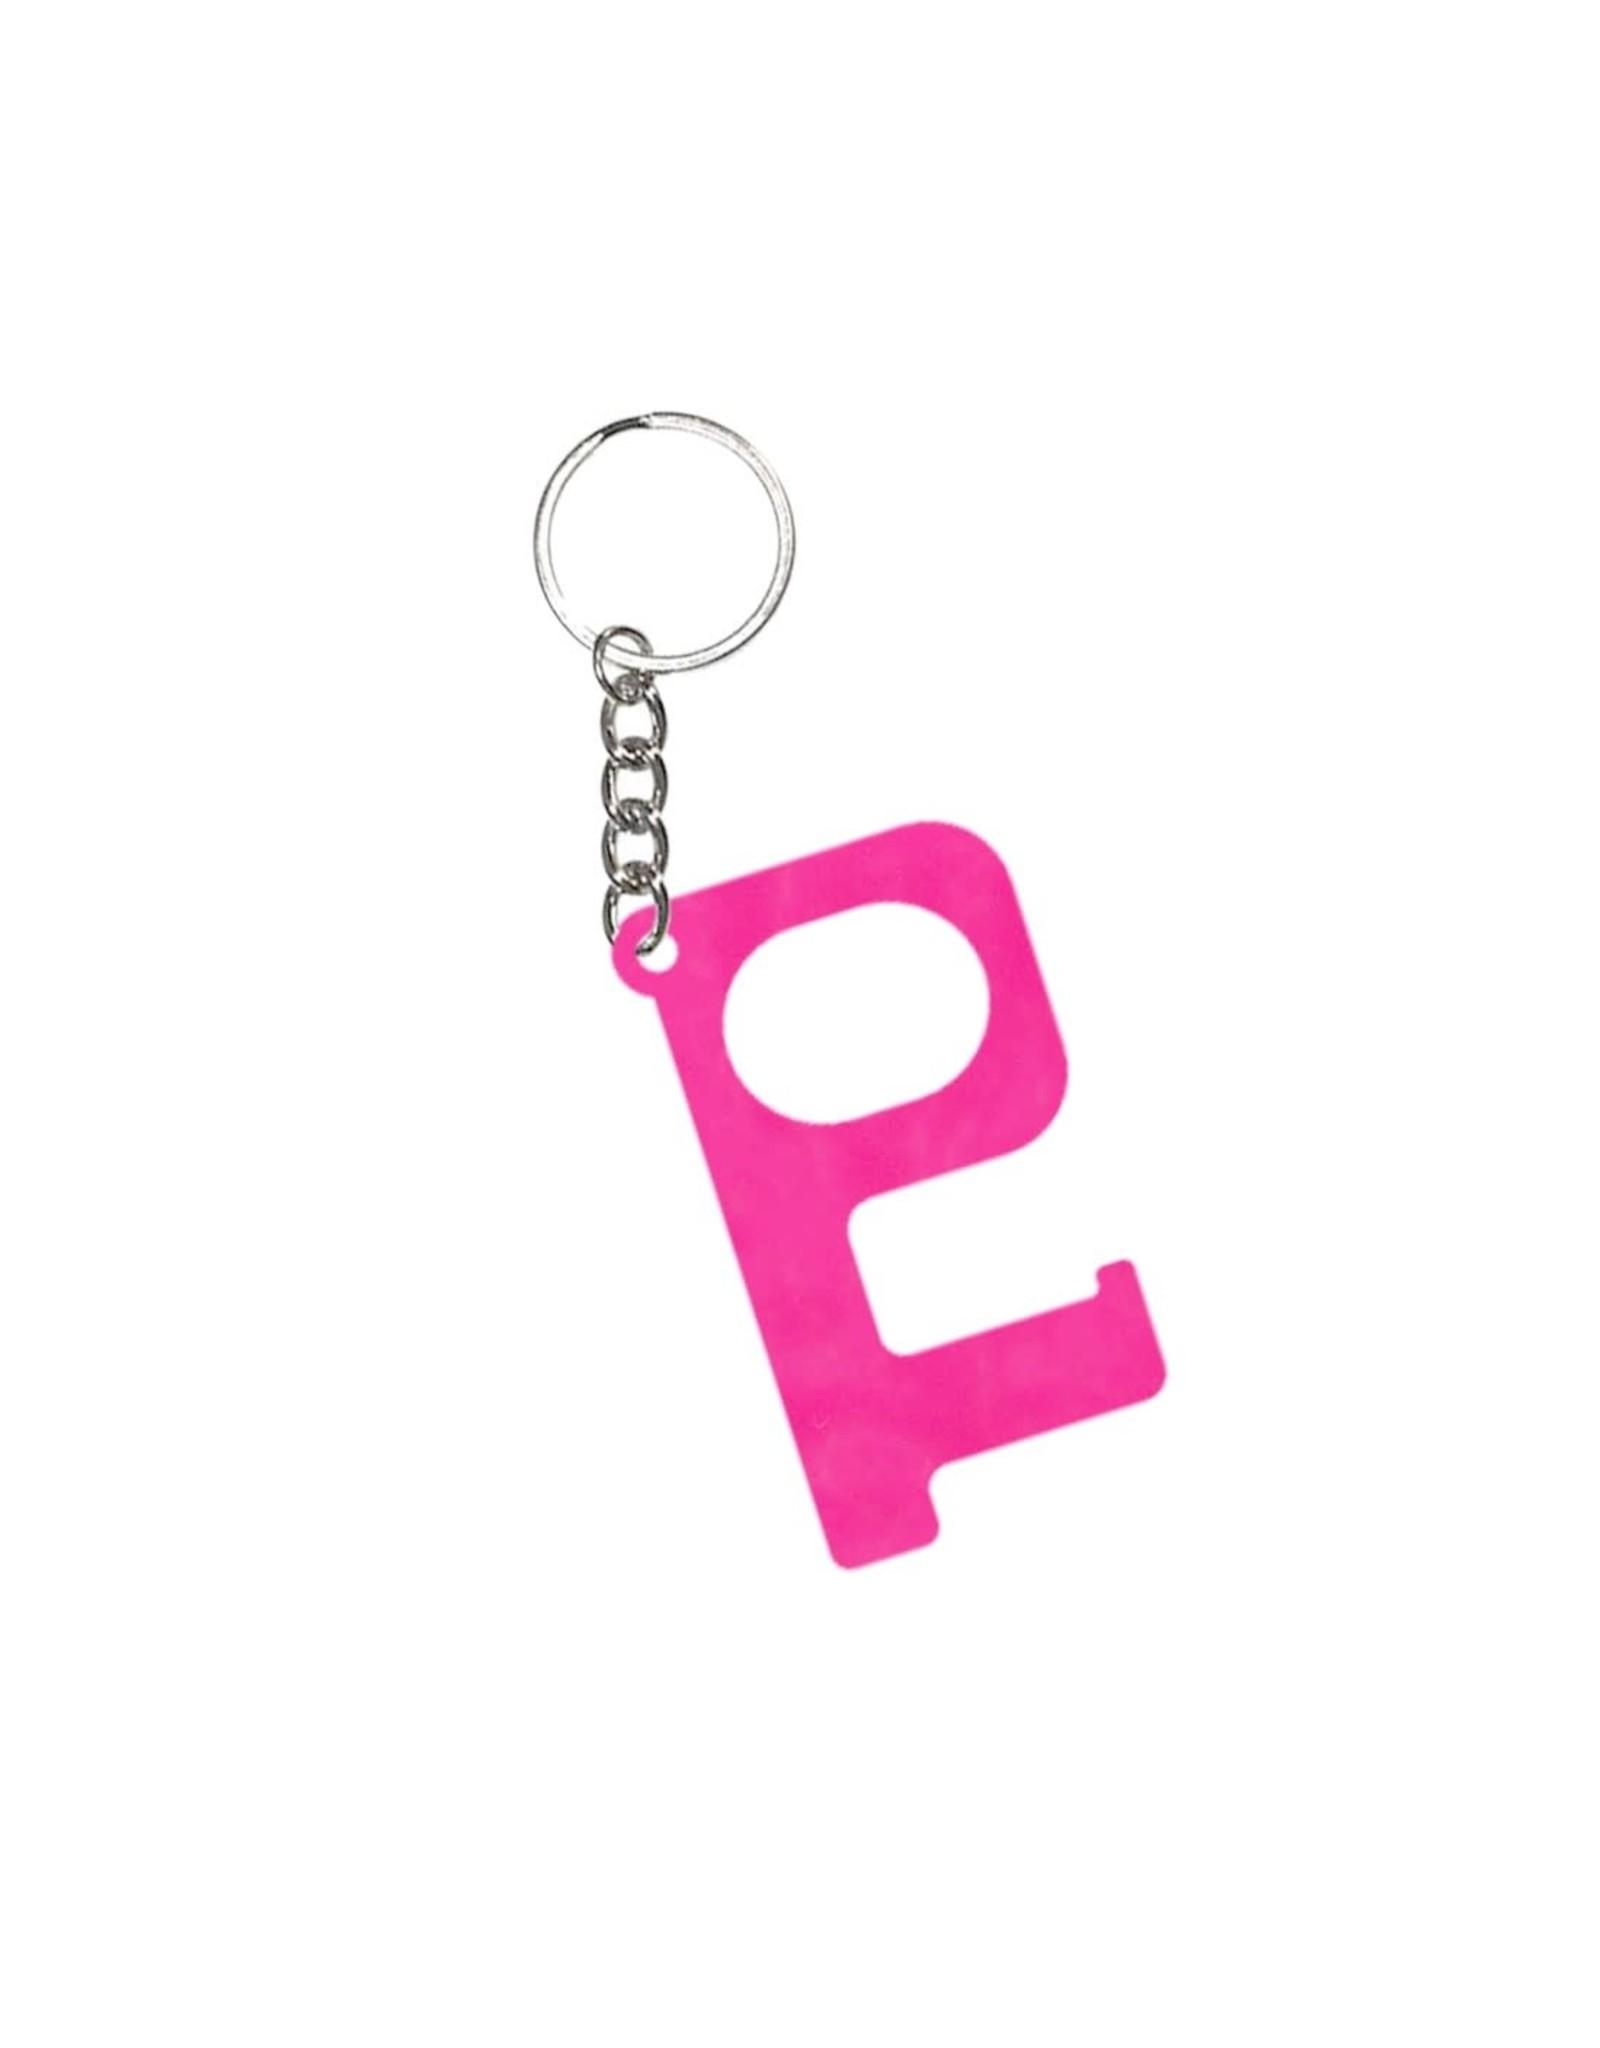 Acrylic Door Key, Pink